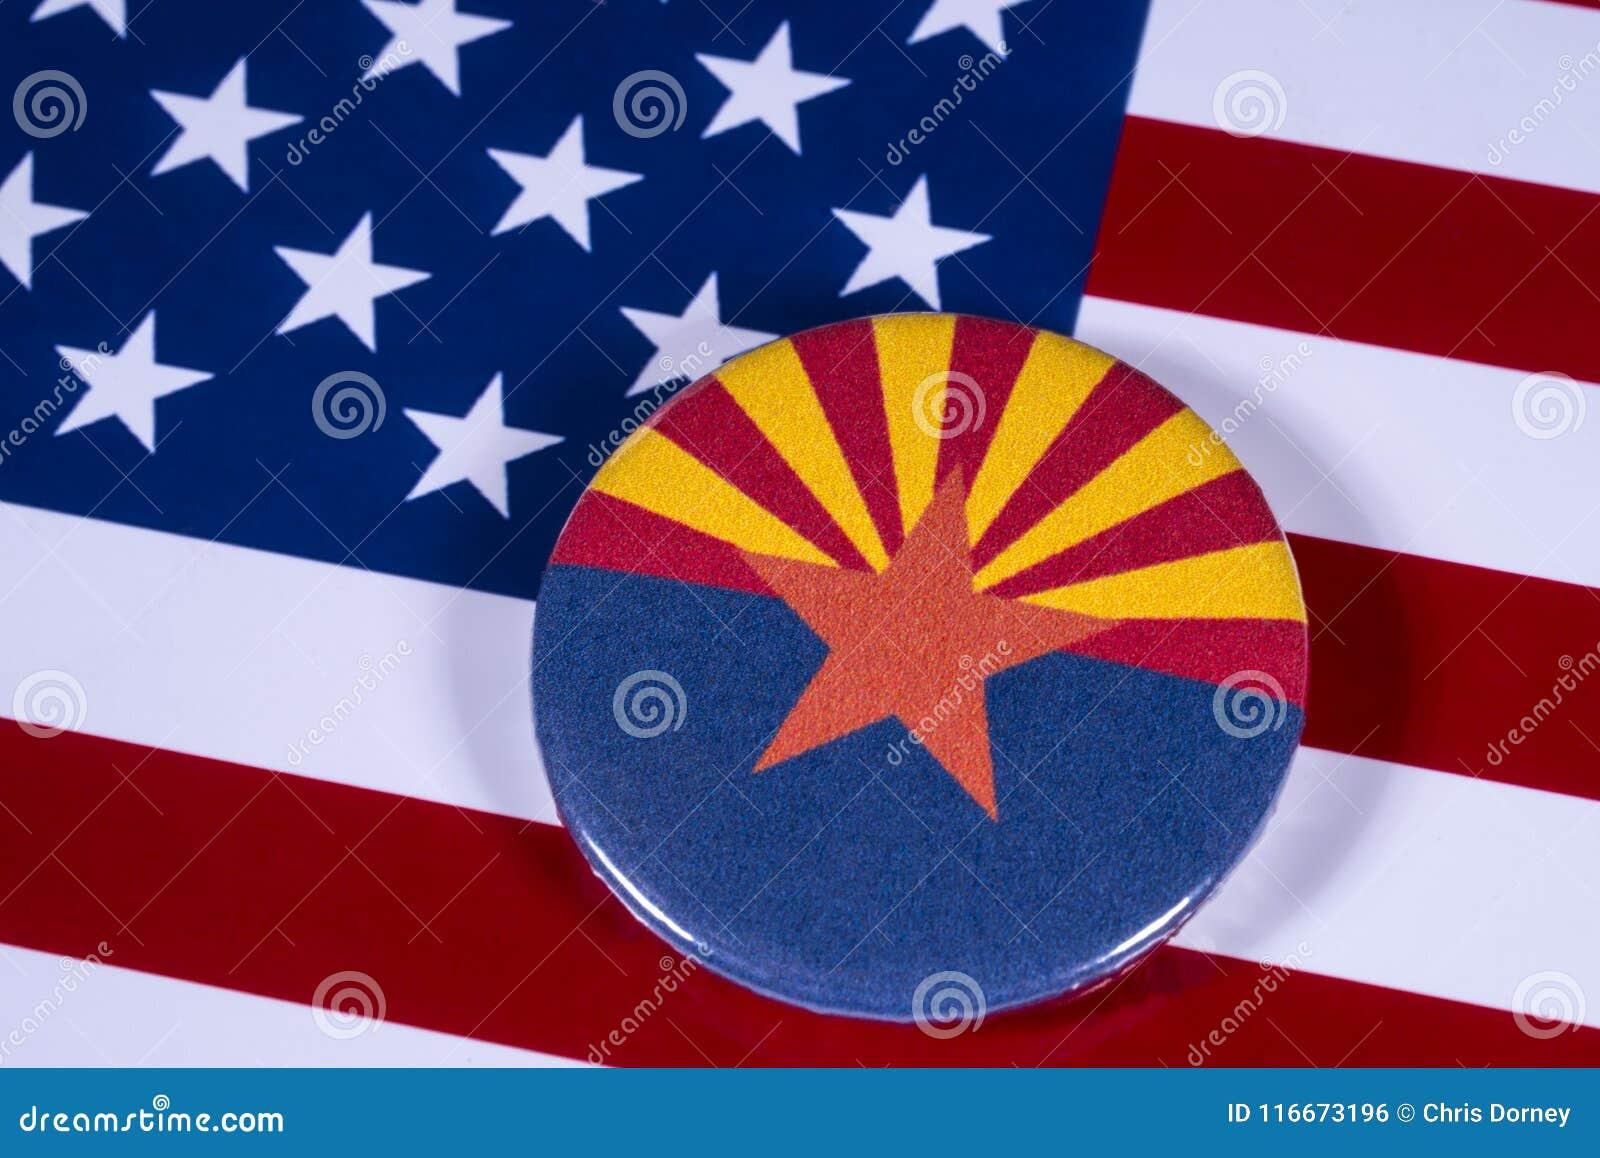 State Of Arizona In The Usa Editorial Photo Image Of Globe Global